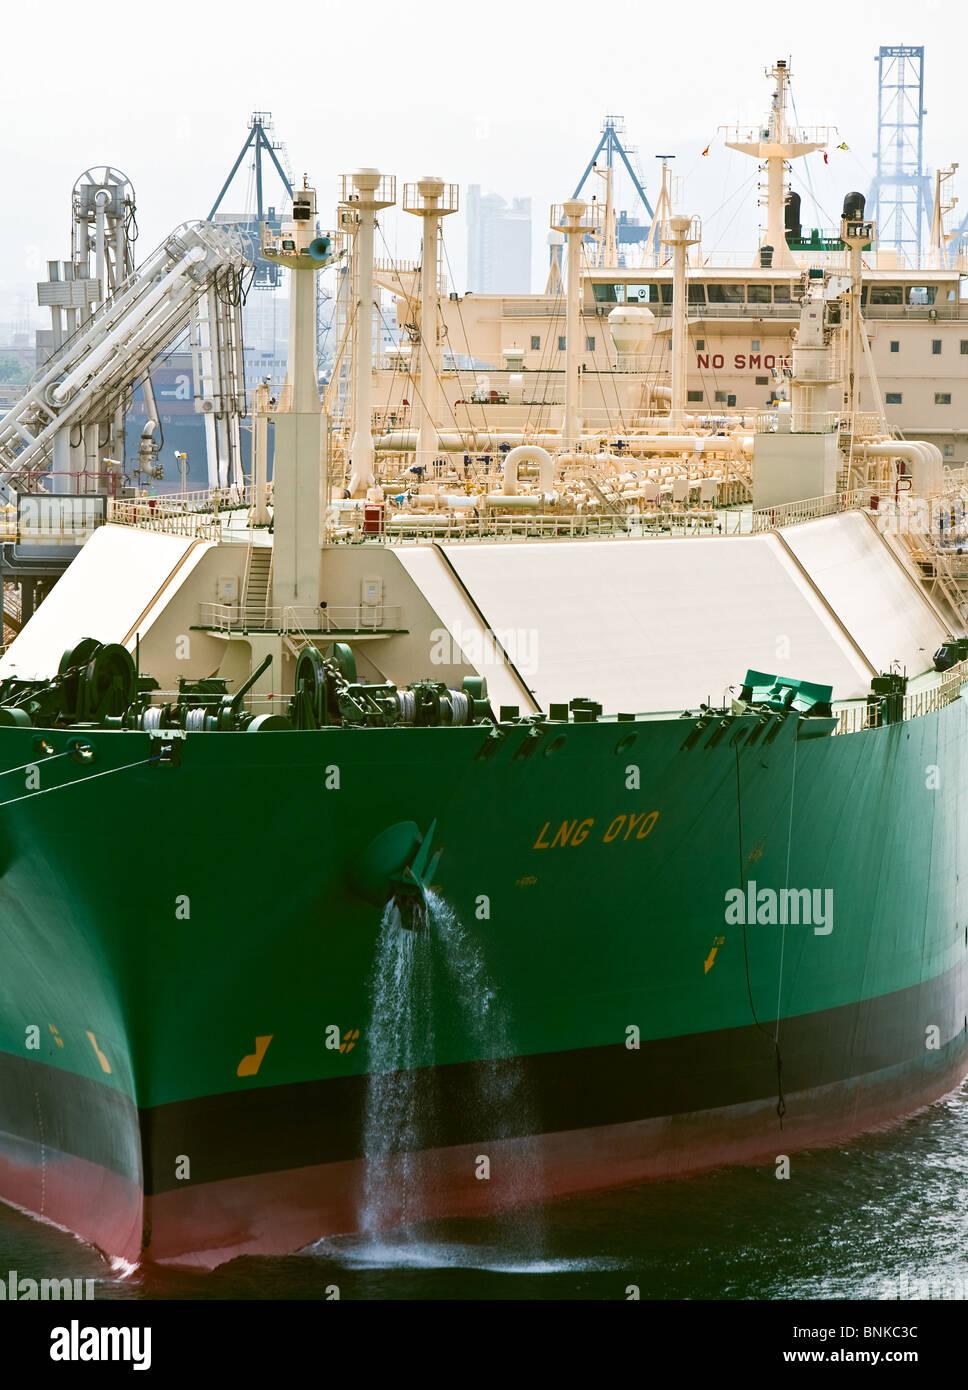 lng  tanker oyo discharging liquefied natural gas cargo at Barcelona terminal Stock Photo